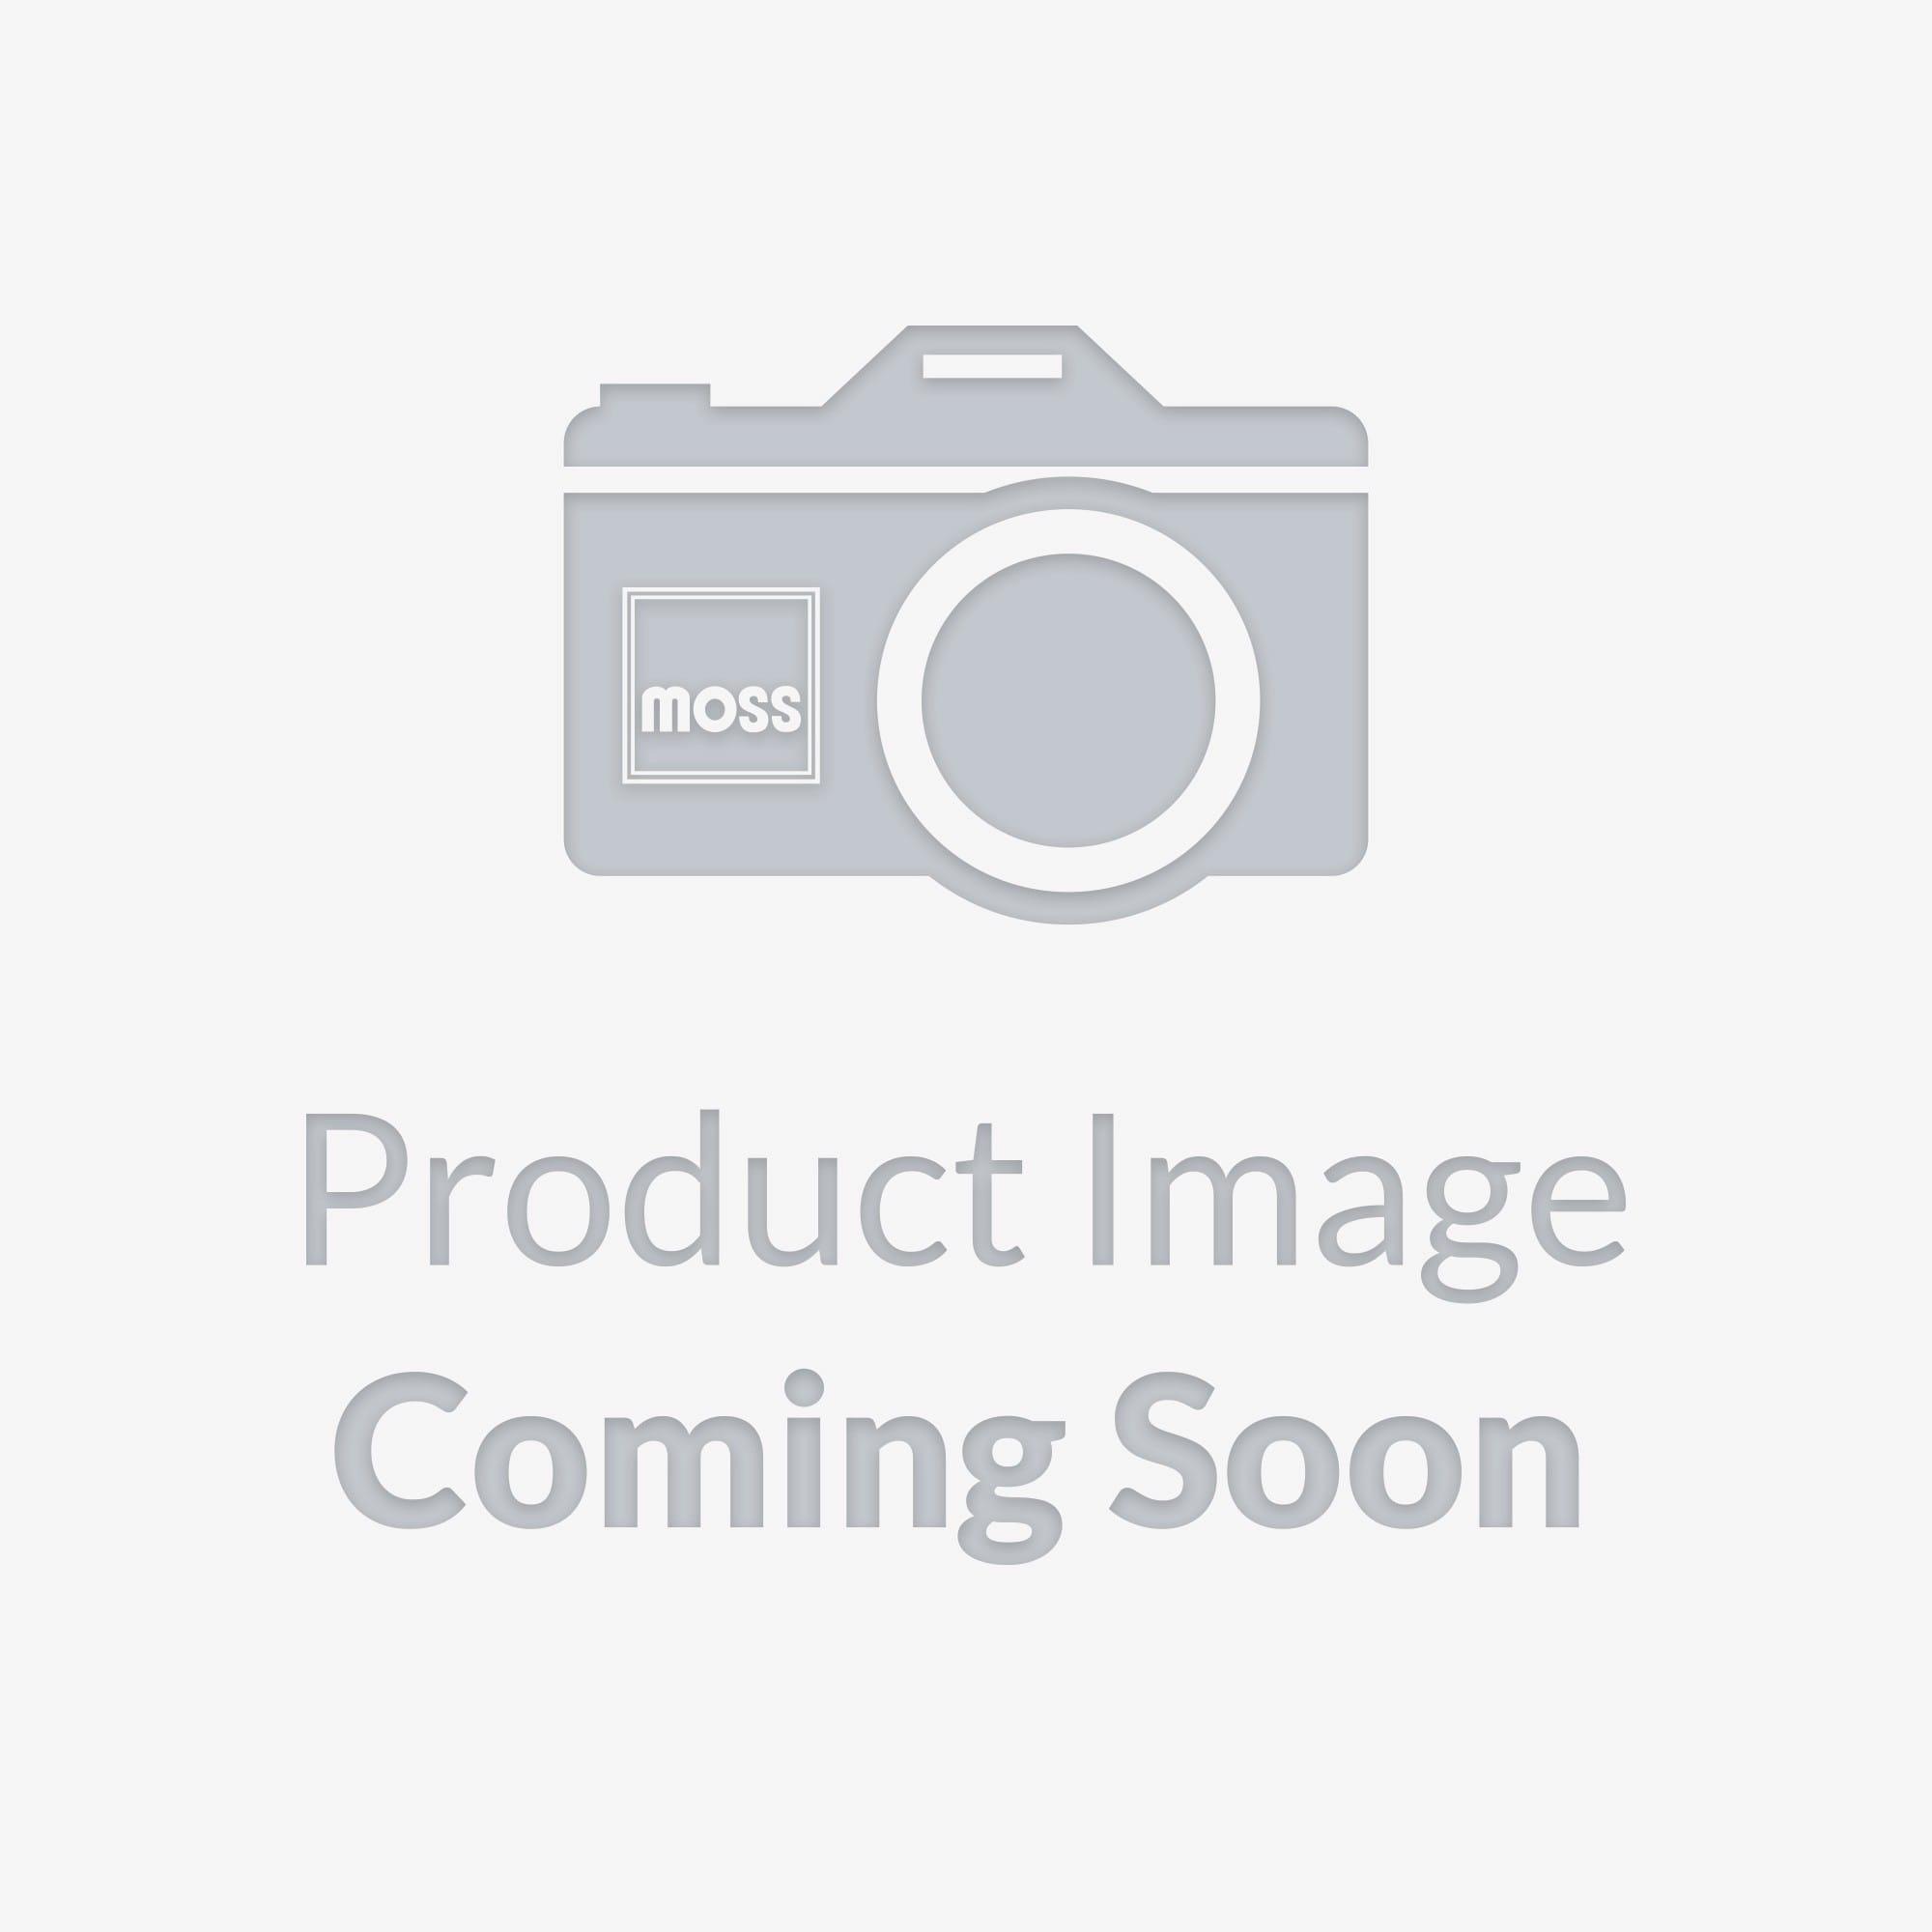 cad6ca1ceecab 219-948 Triumph GT6 Hat